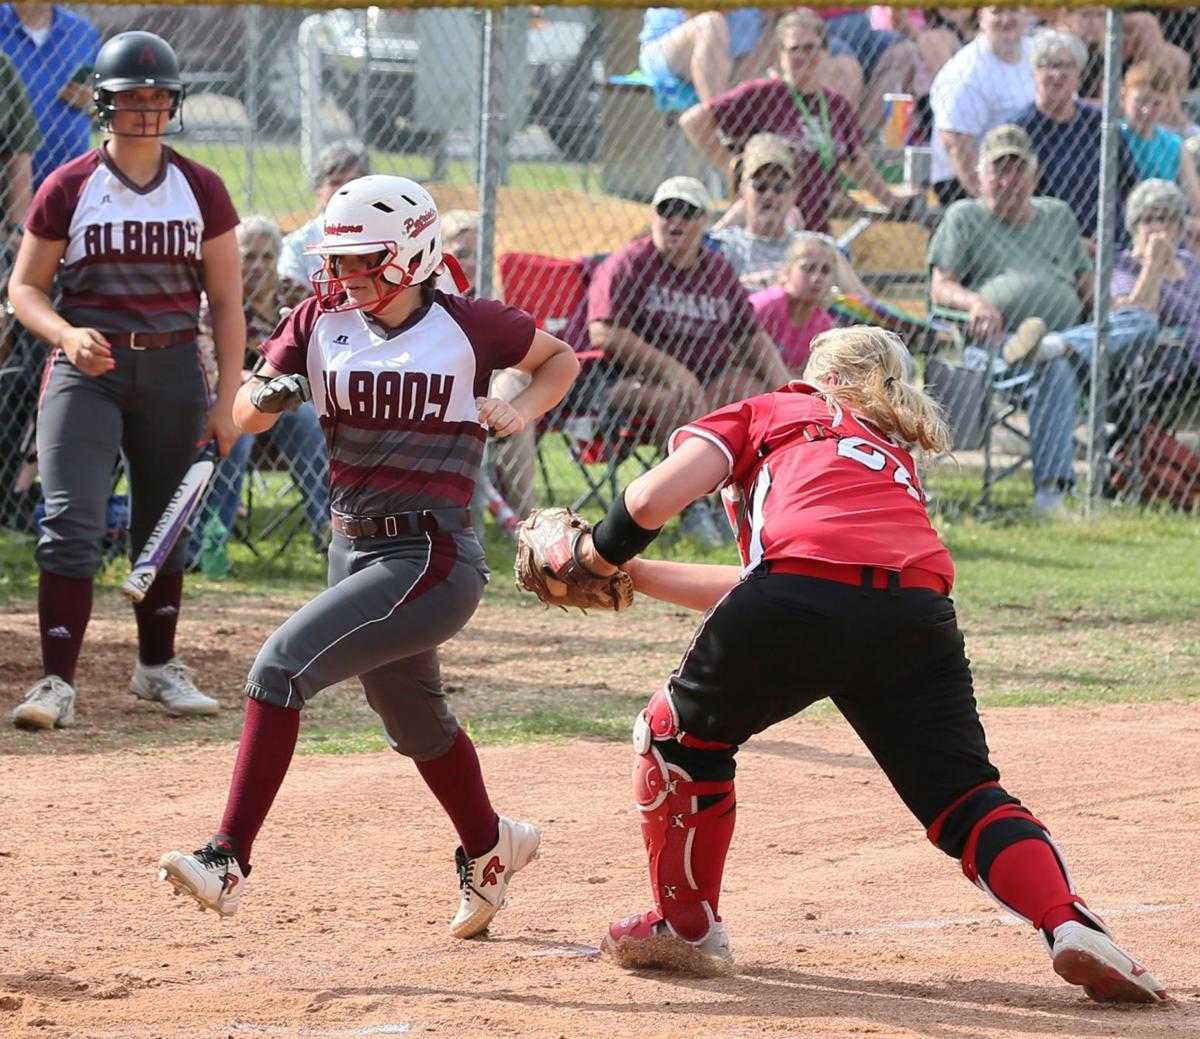 Port Barre-Albany softball Annalea Giamalva